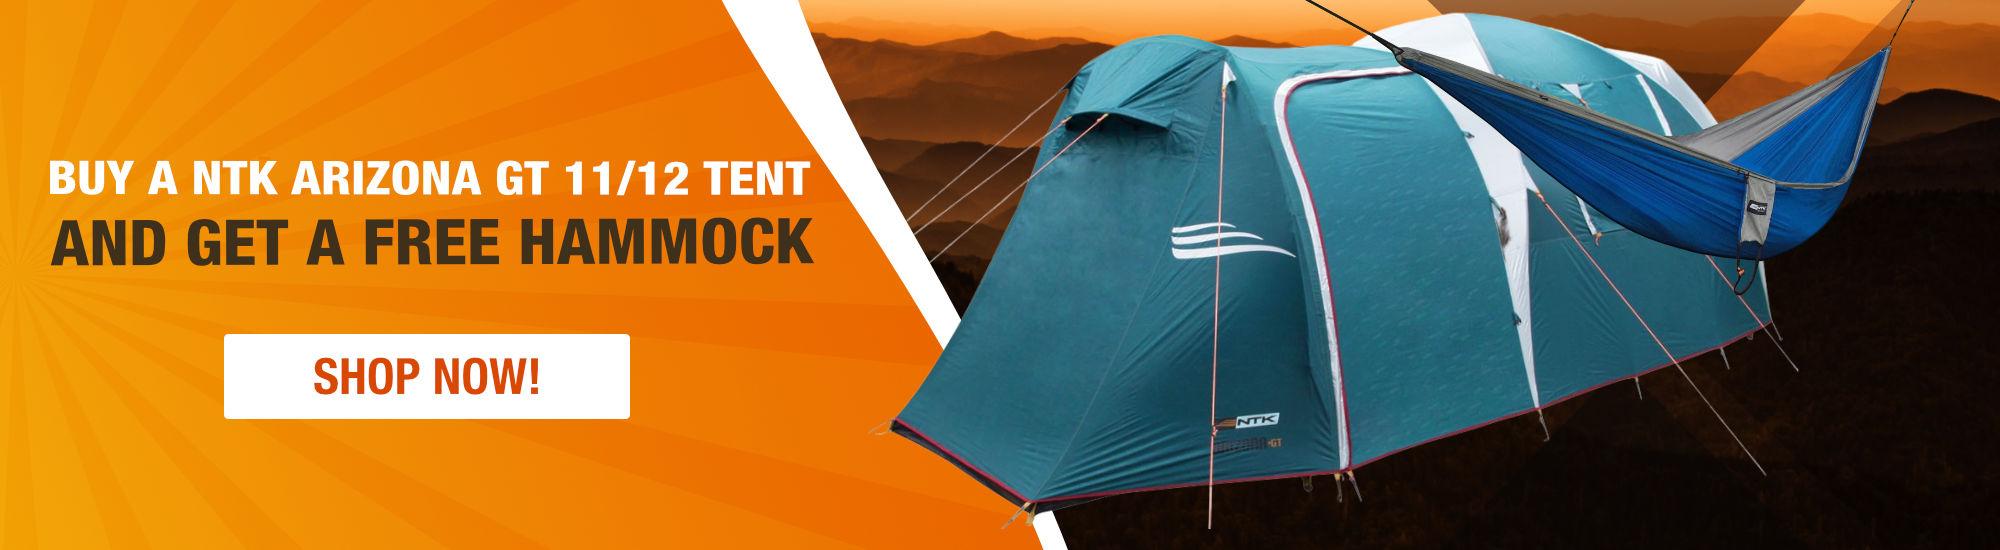 Buy a NTK Arizona GT 11/12 and get a free hammock